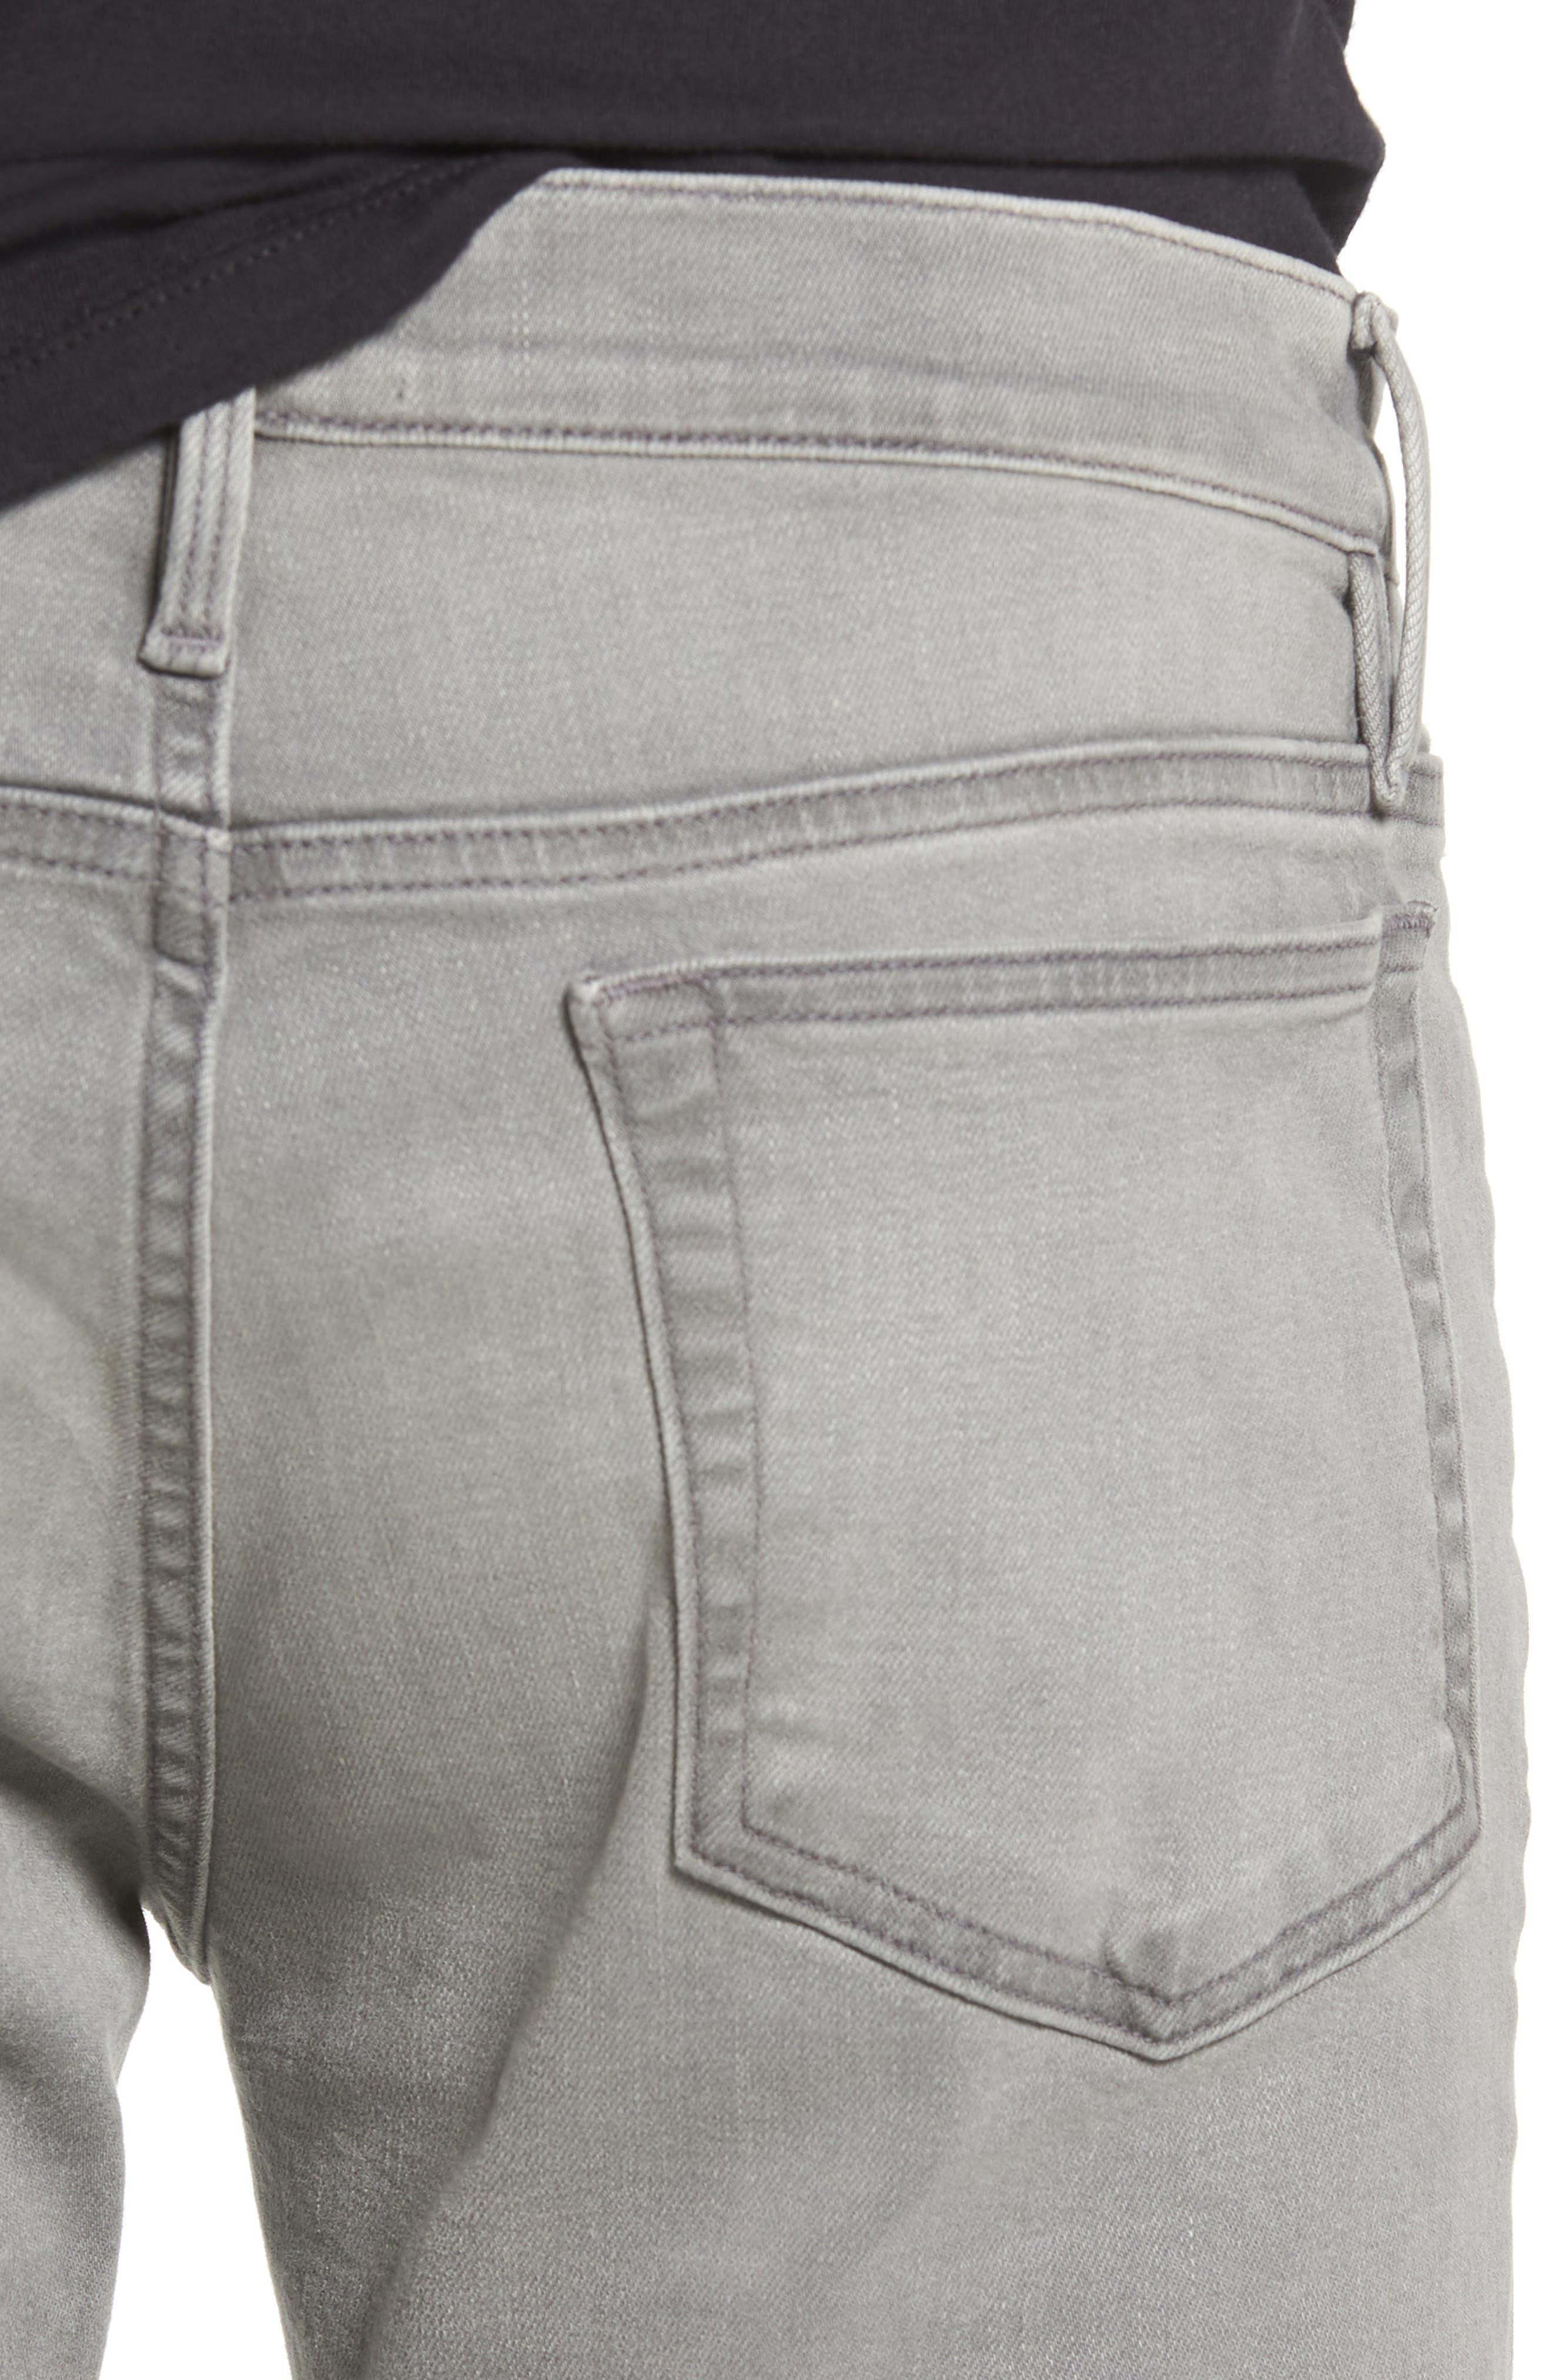 L'Homme Skinny Fit Jeans,                             Alternate thumbnail 4, color,                             030